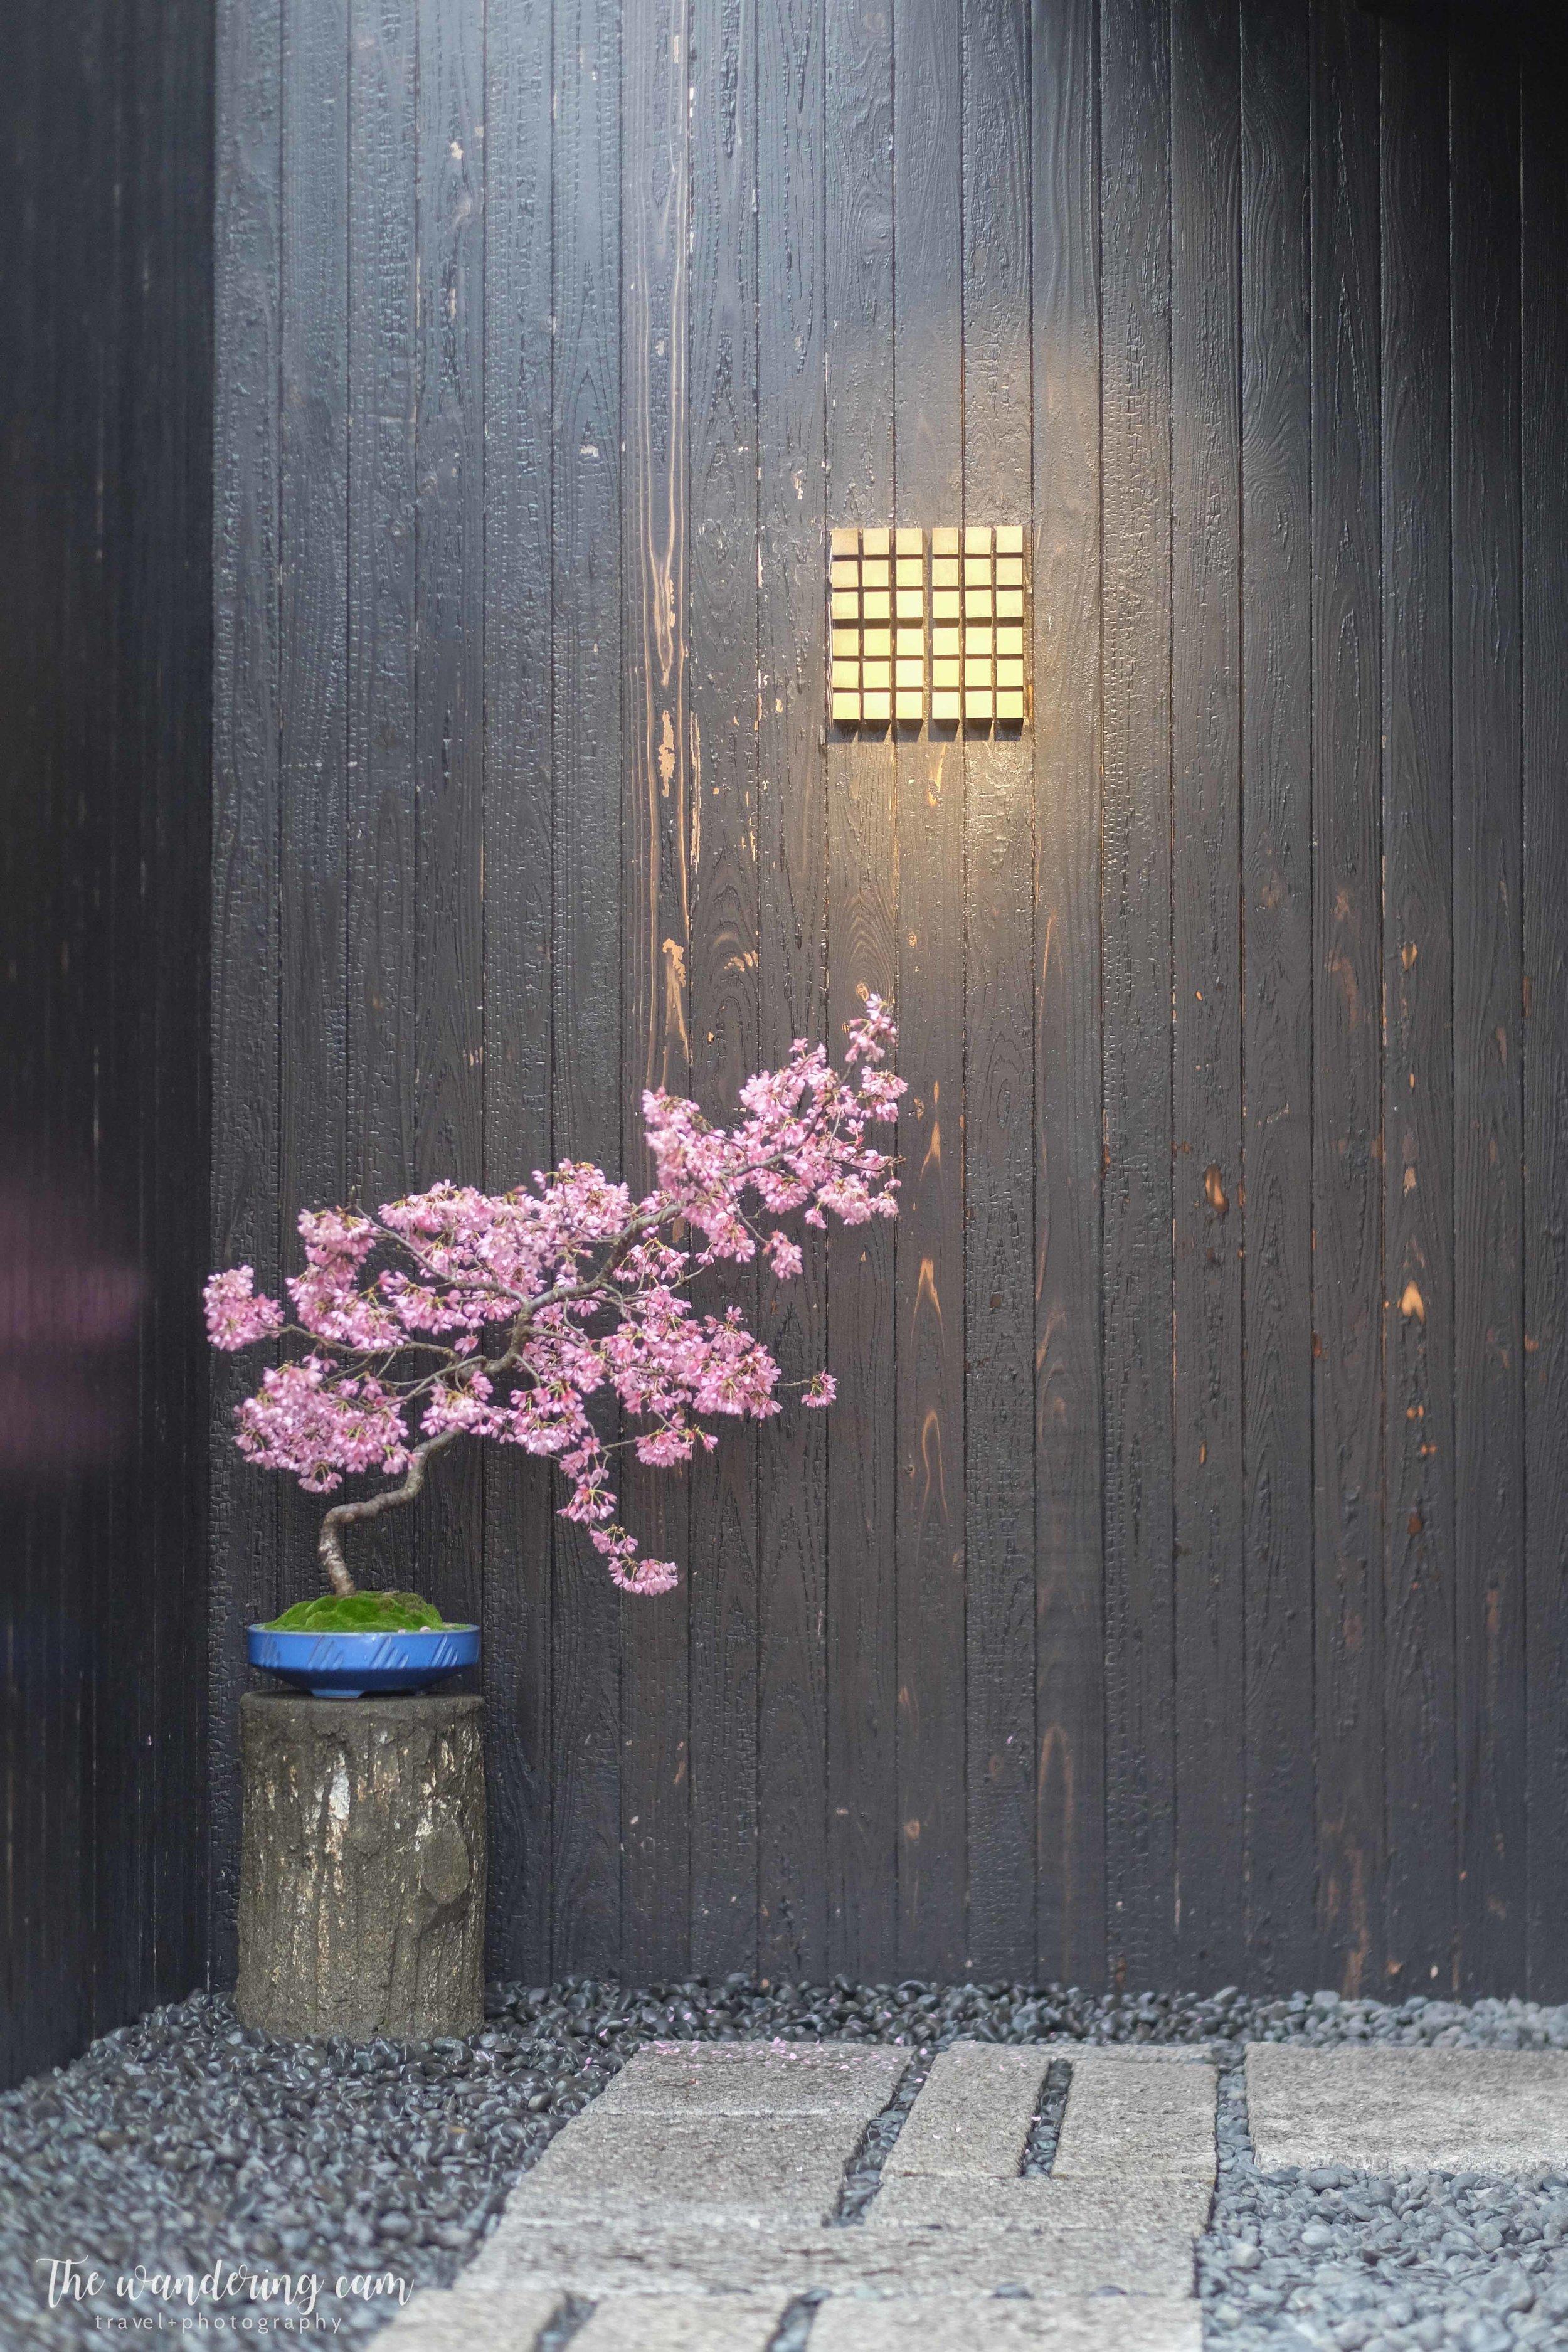 thewanderingcam_sakura_koffeemameya-3952.jpg